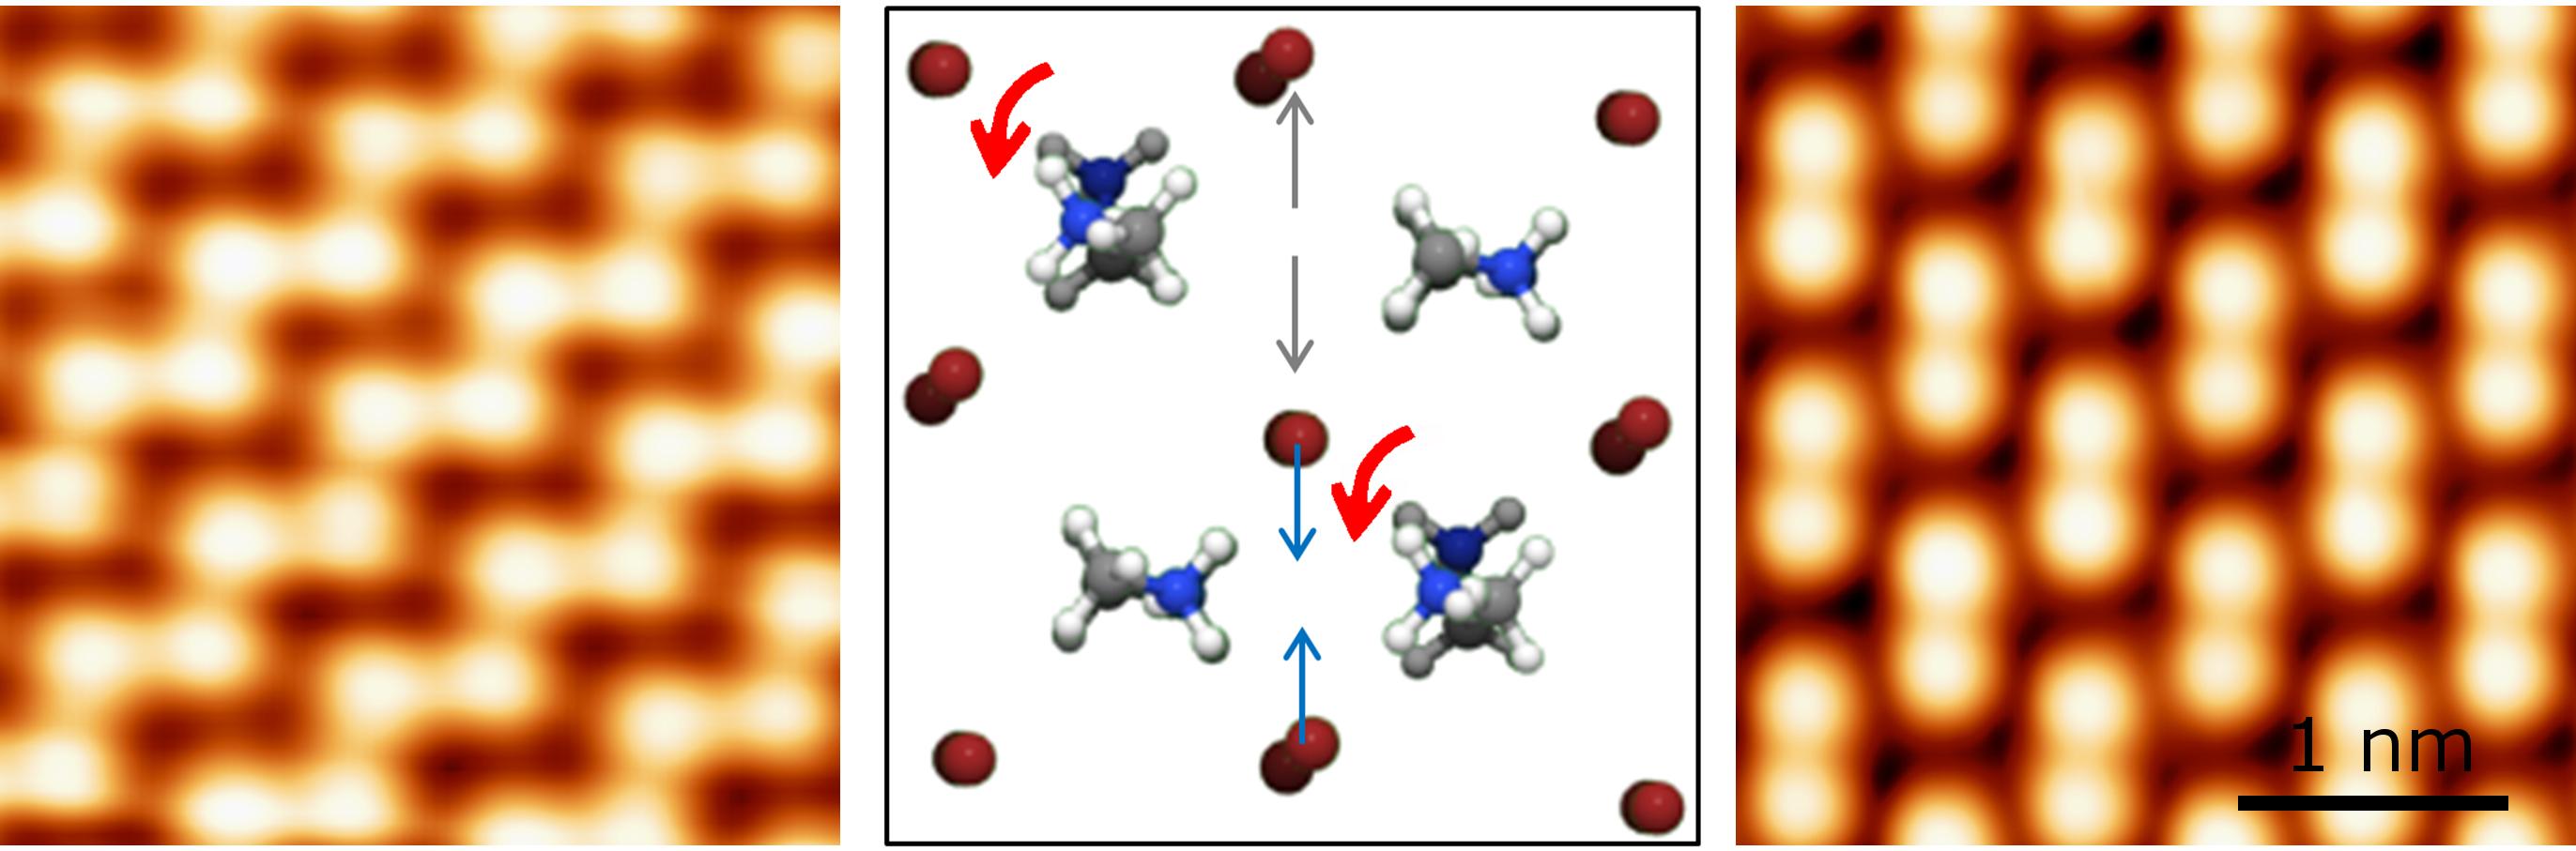 Perovskites atomic resolution images